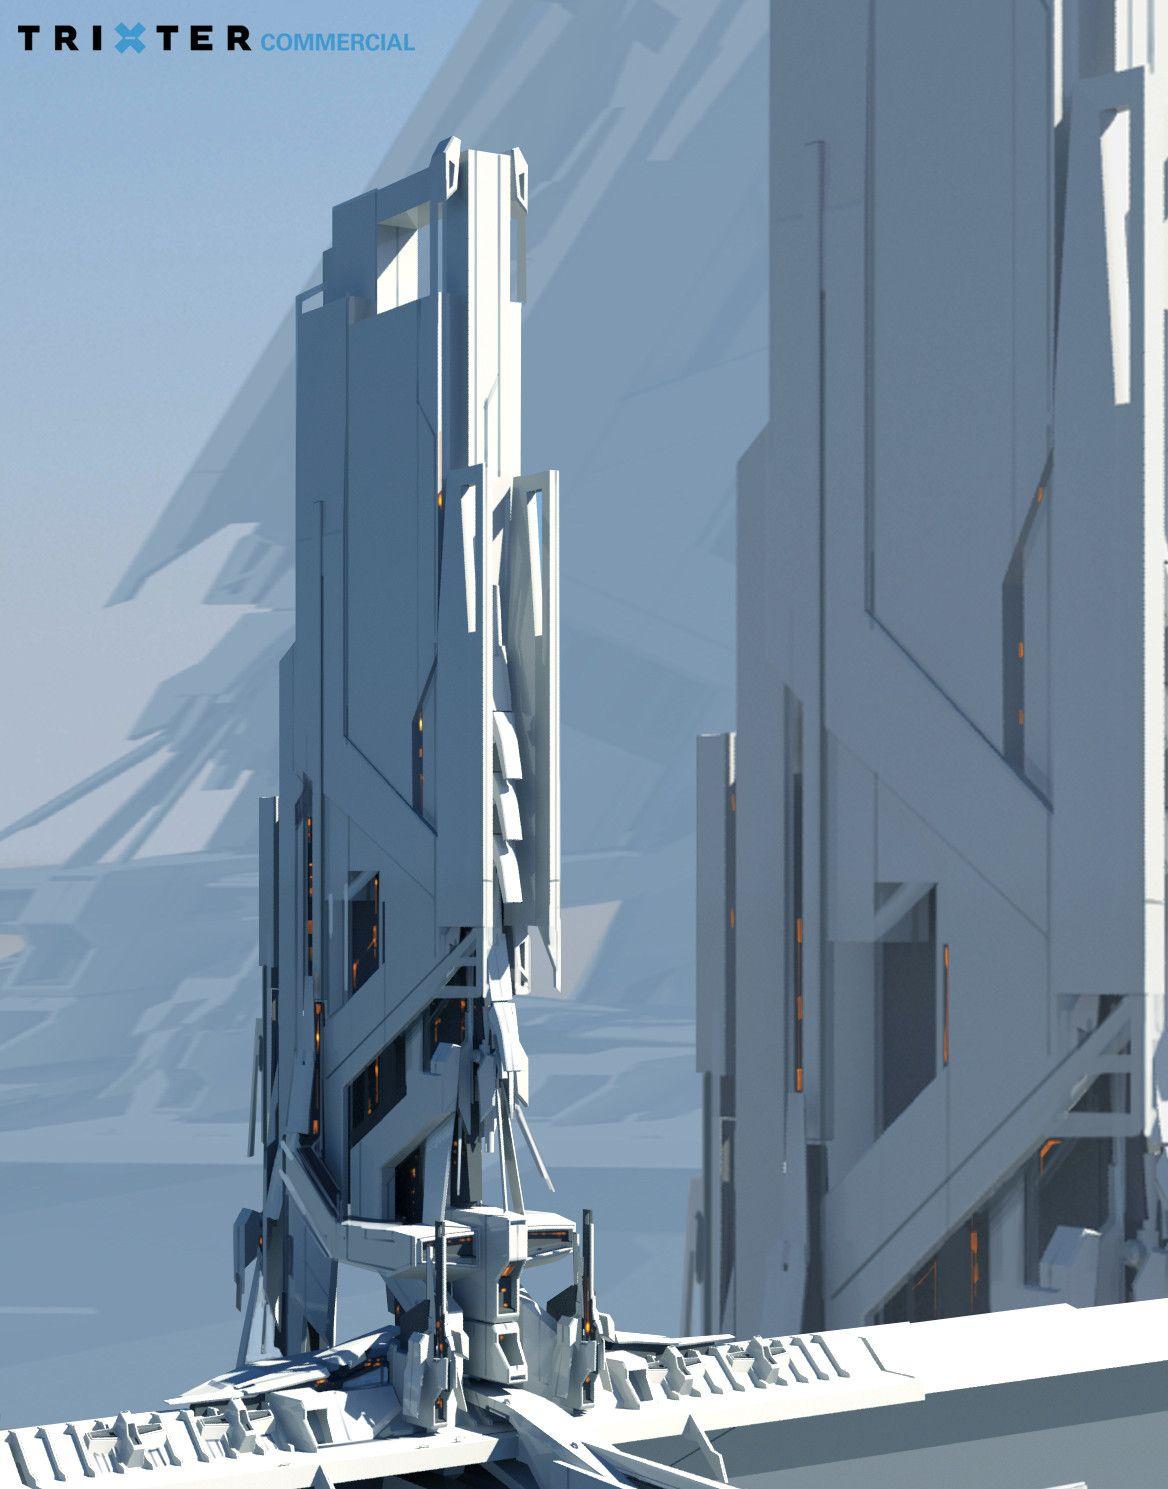 Artstation Environment Concept Art Michael Oberschneider Environment Concept Art Futuristic Architecture Sci Fi Concept Art